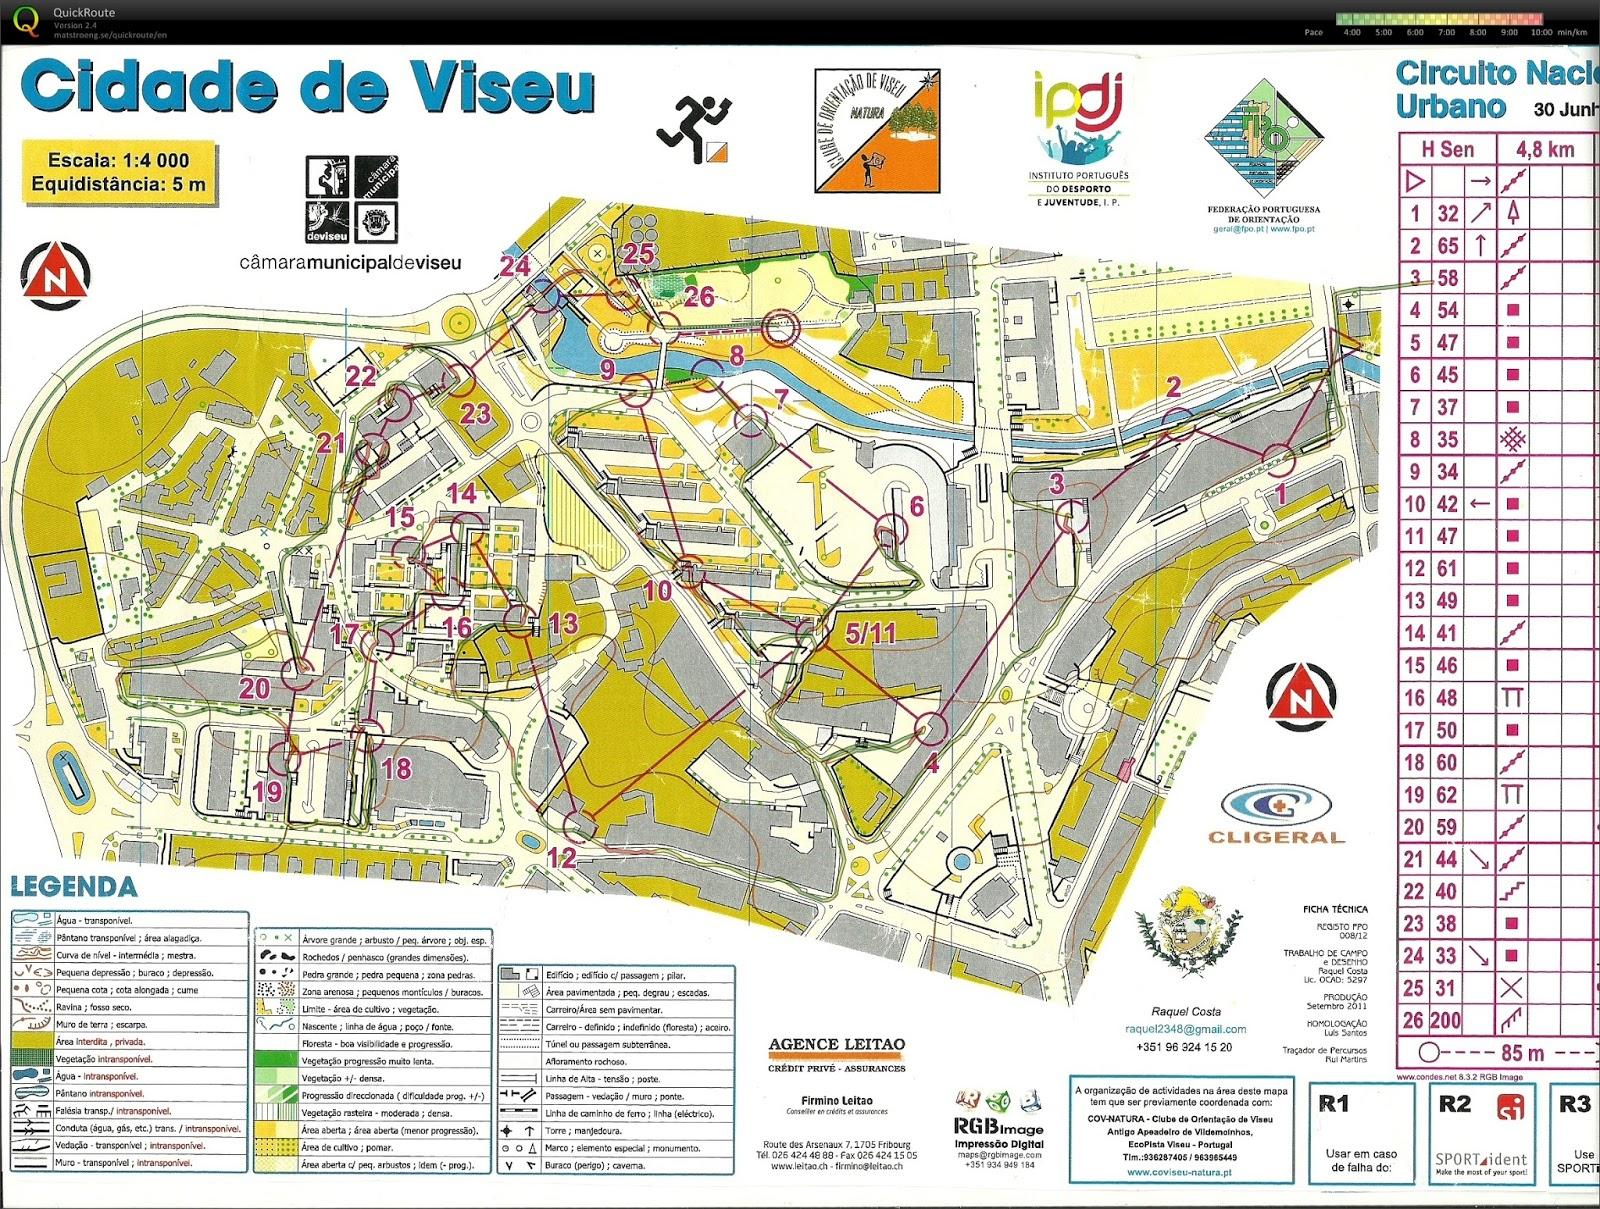 mapa cidade de viseu SÓ MAPAS: Troféu Orientação Cidade Viseu mapa cidade de viseu